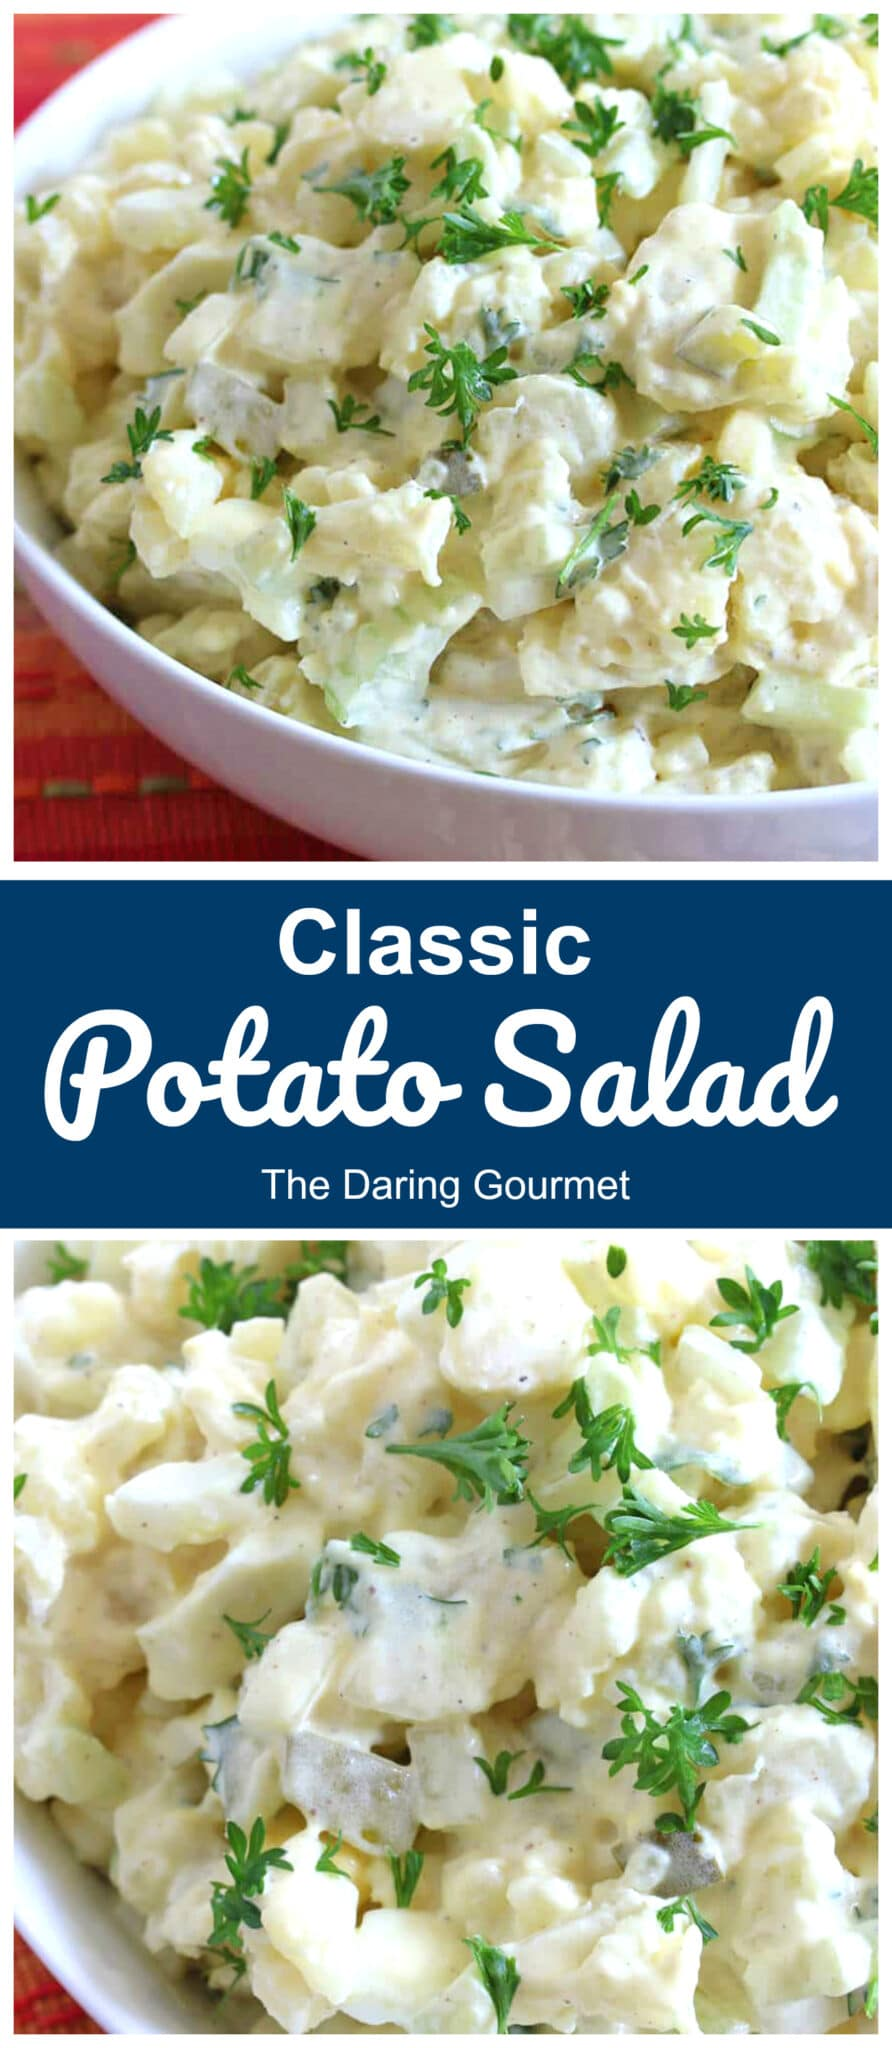 potato salad recipe best homemade classic creamy pickles eggs mayonnaise